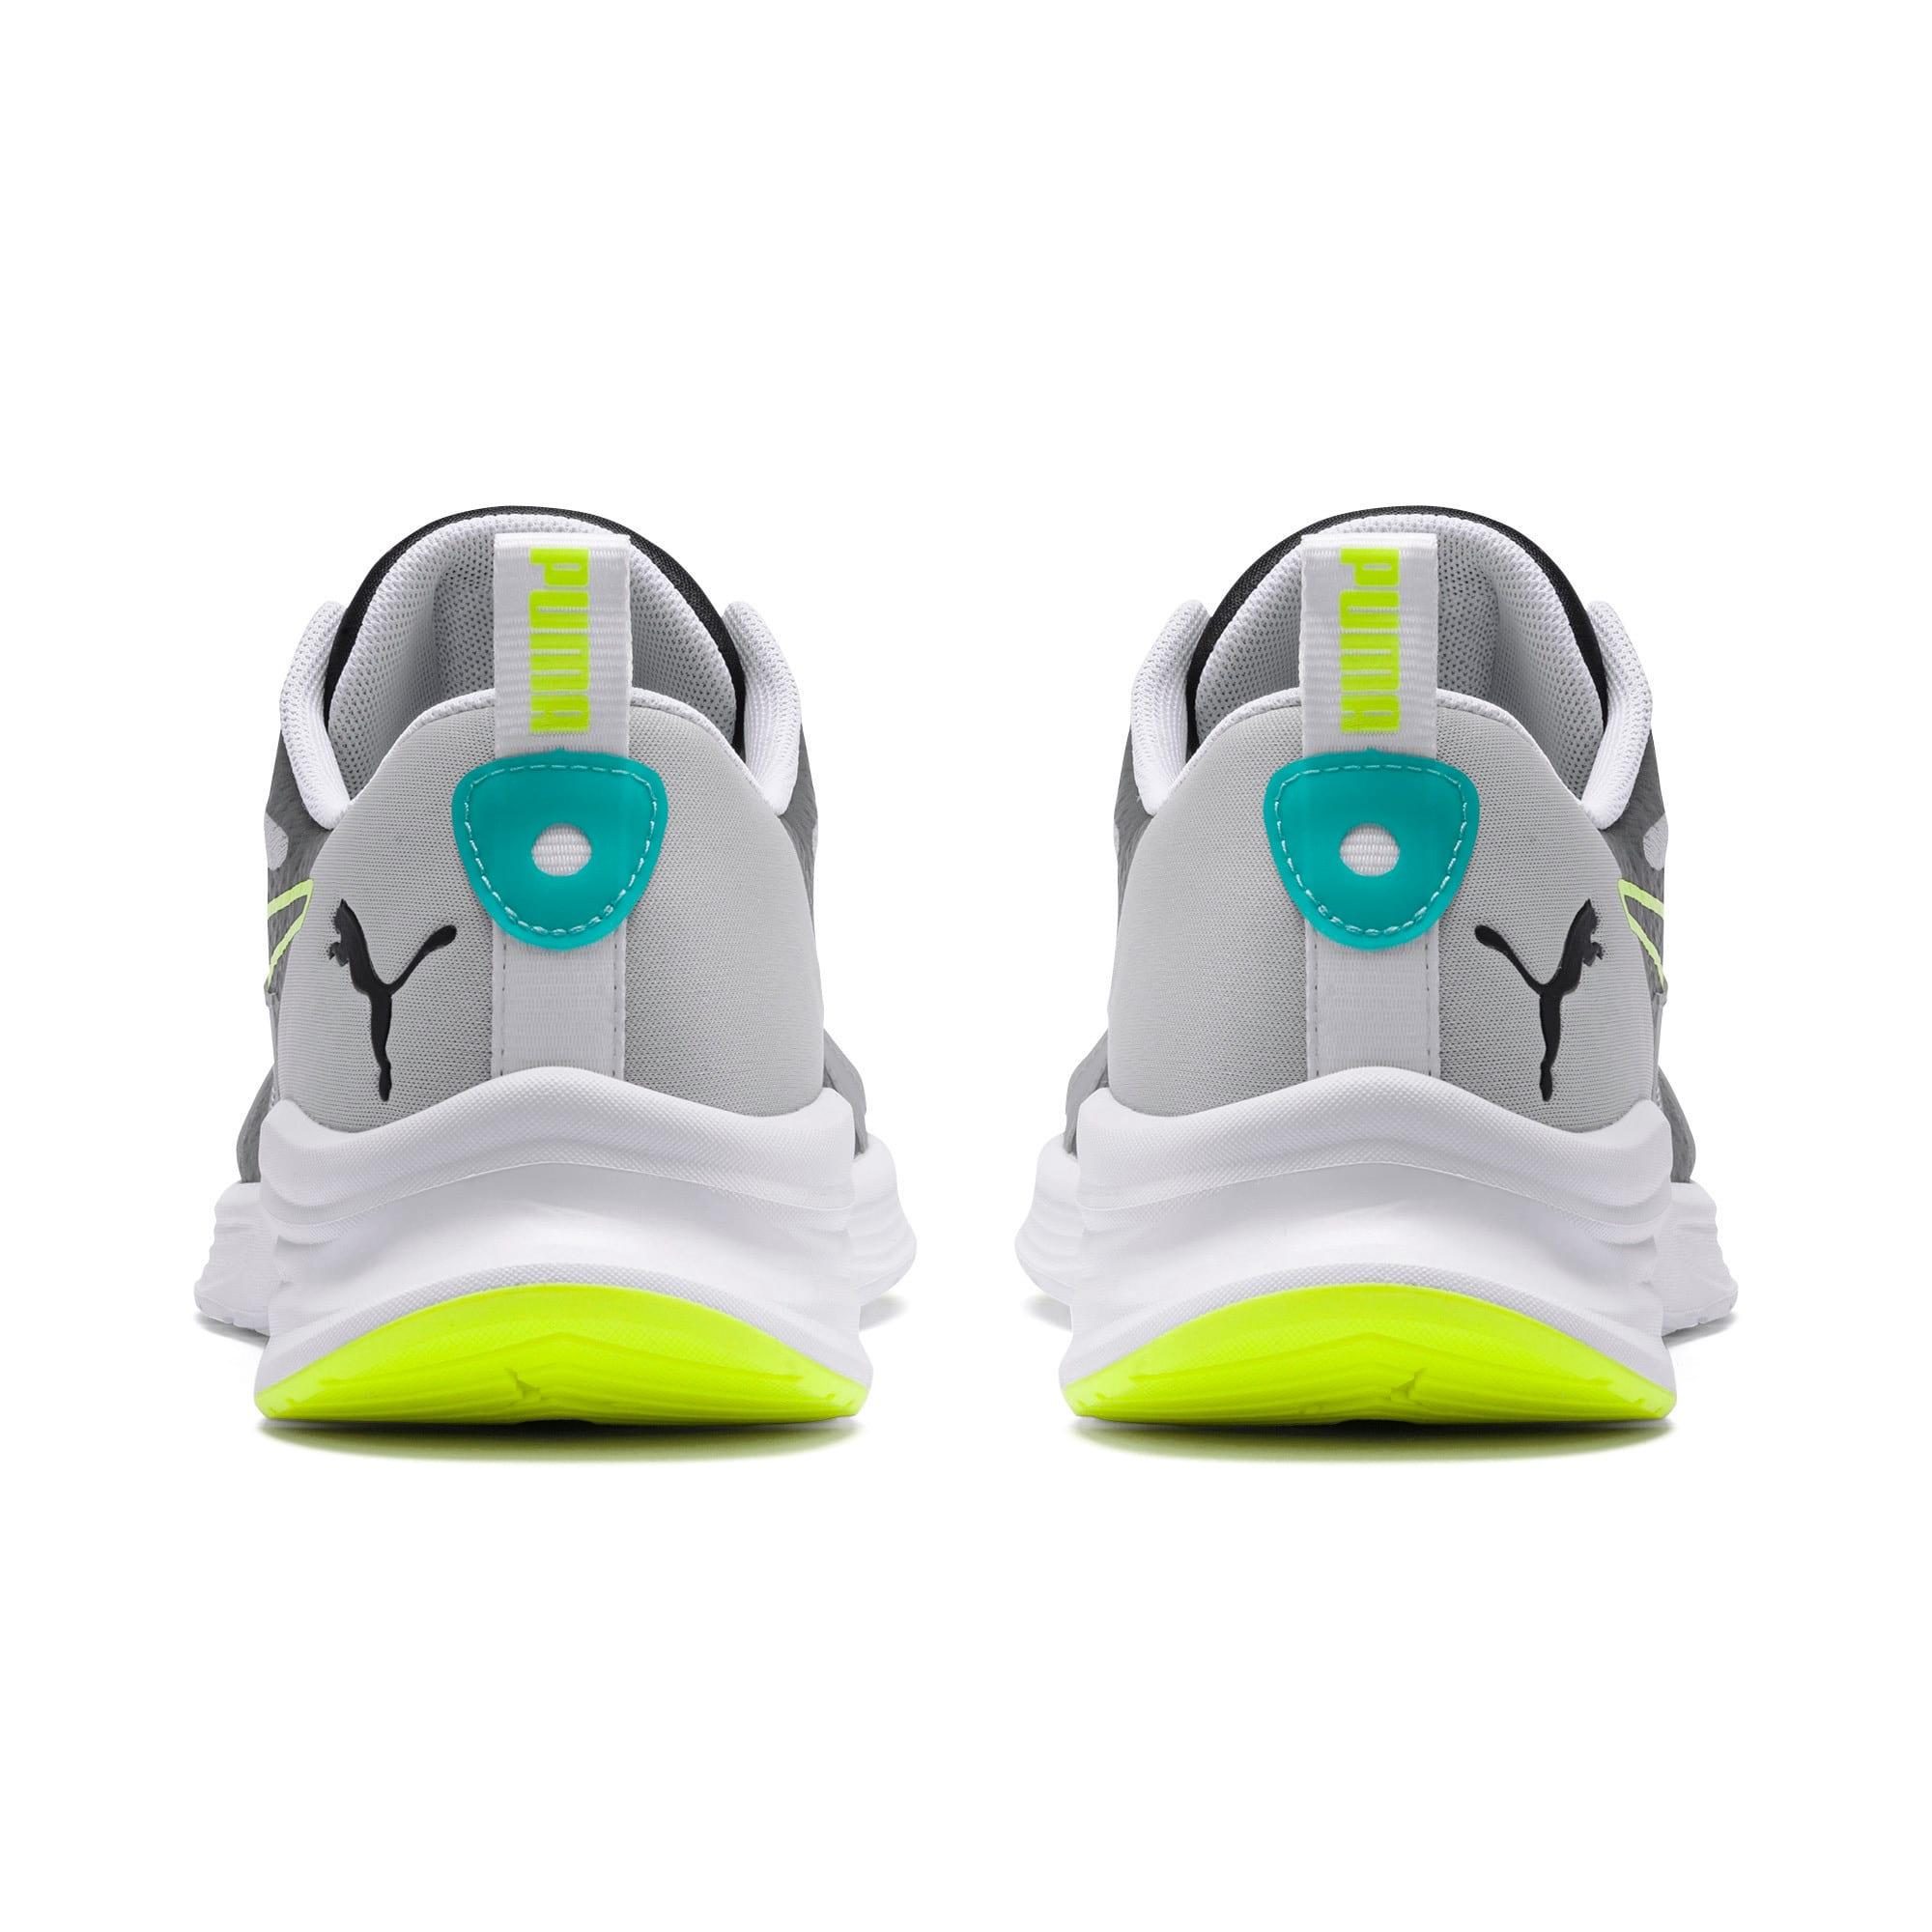 Miniatura 3 de Zapatos para correr HYBRID Fuego para hombre, High Rise-Blue Turquoise, mediano